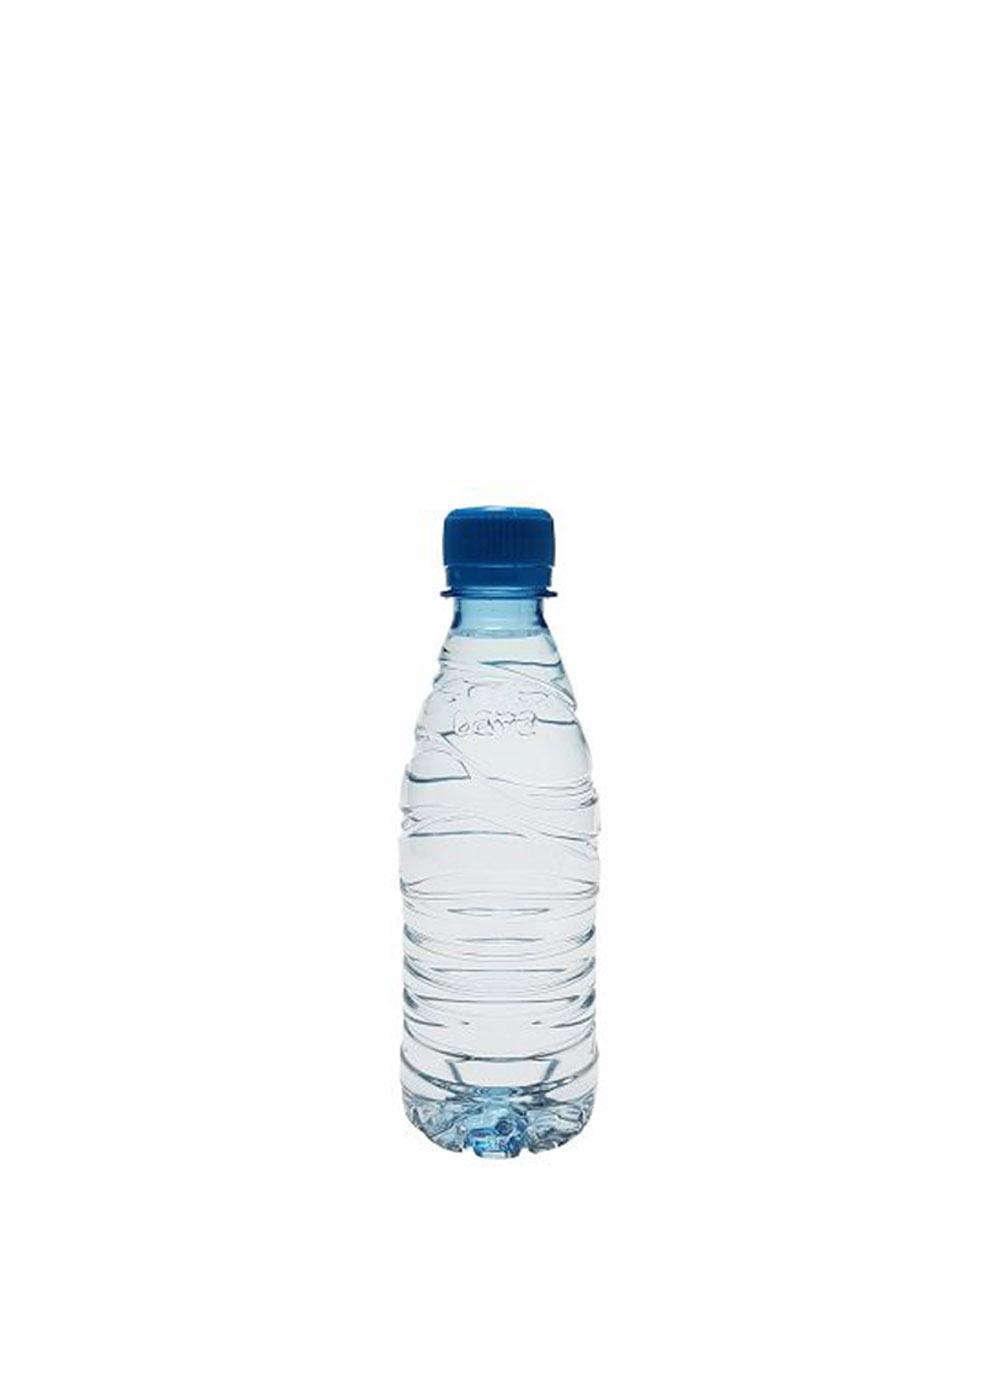 0,33 L PET Voda - Promovoda